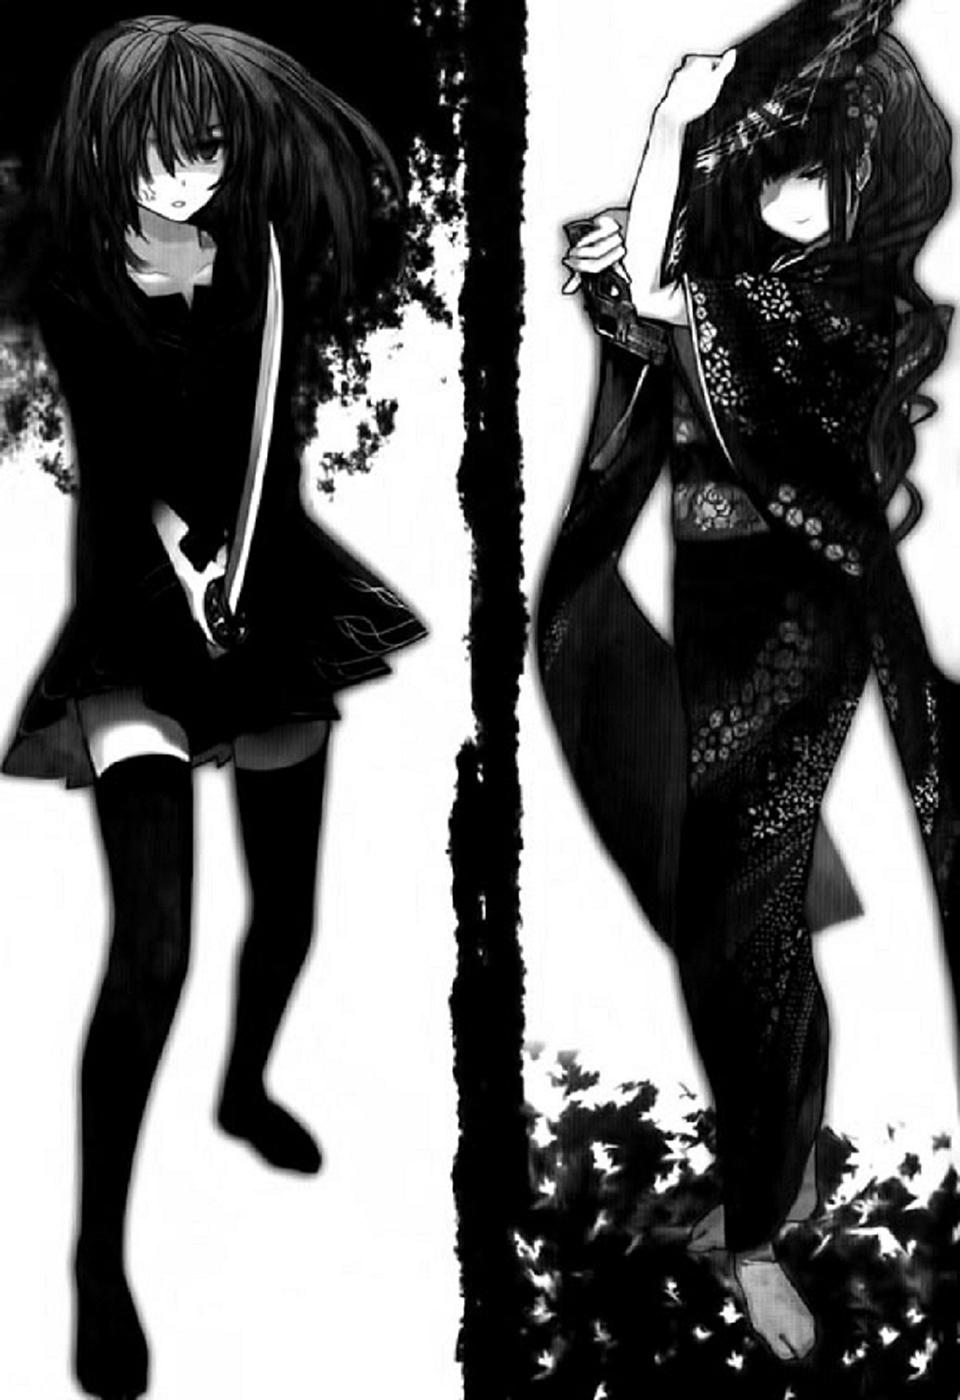 kisara tendo/image gallery | black bullet wiki | fandom poweredwikia